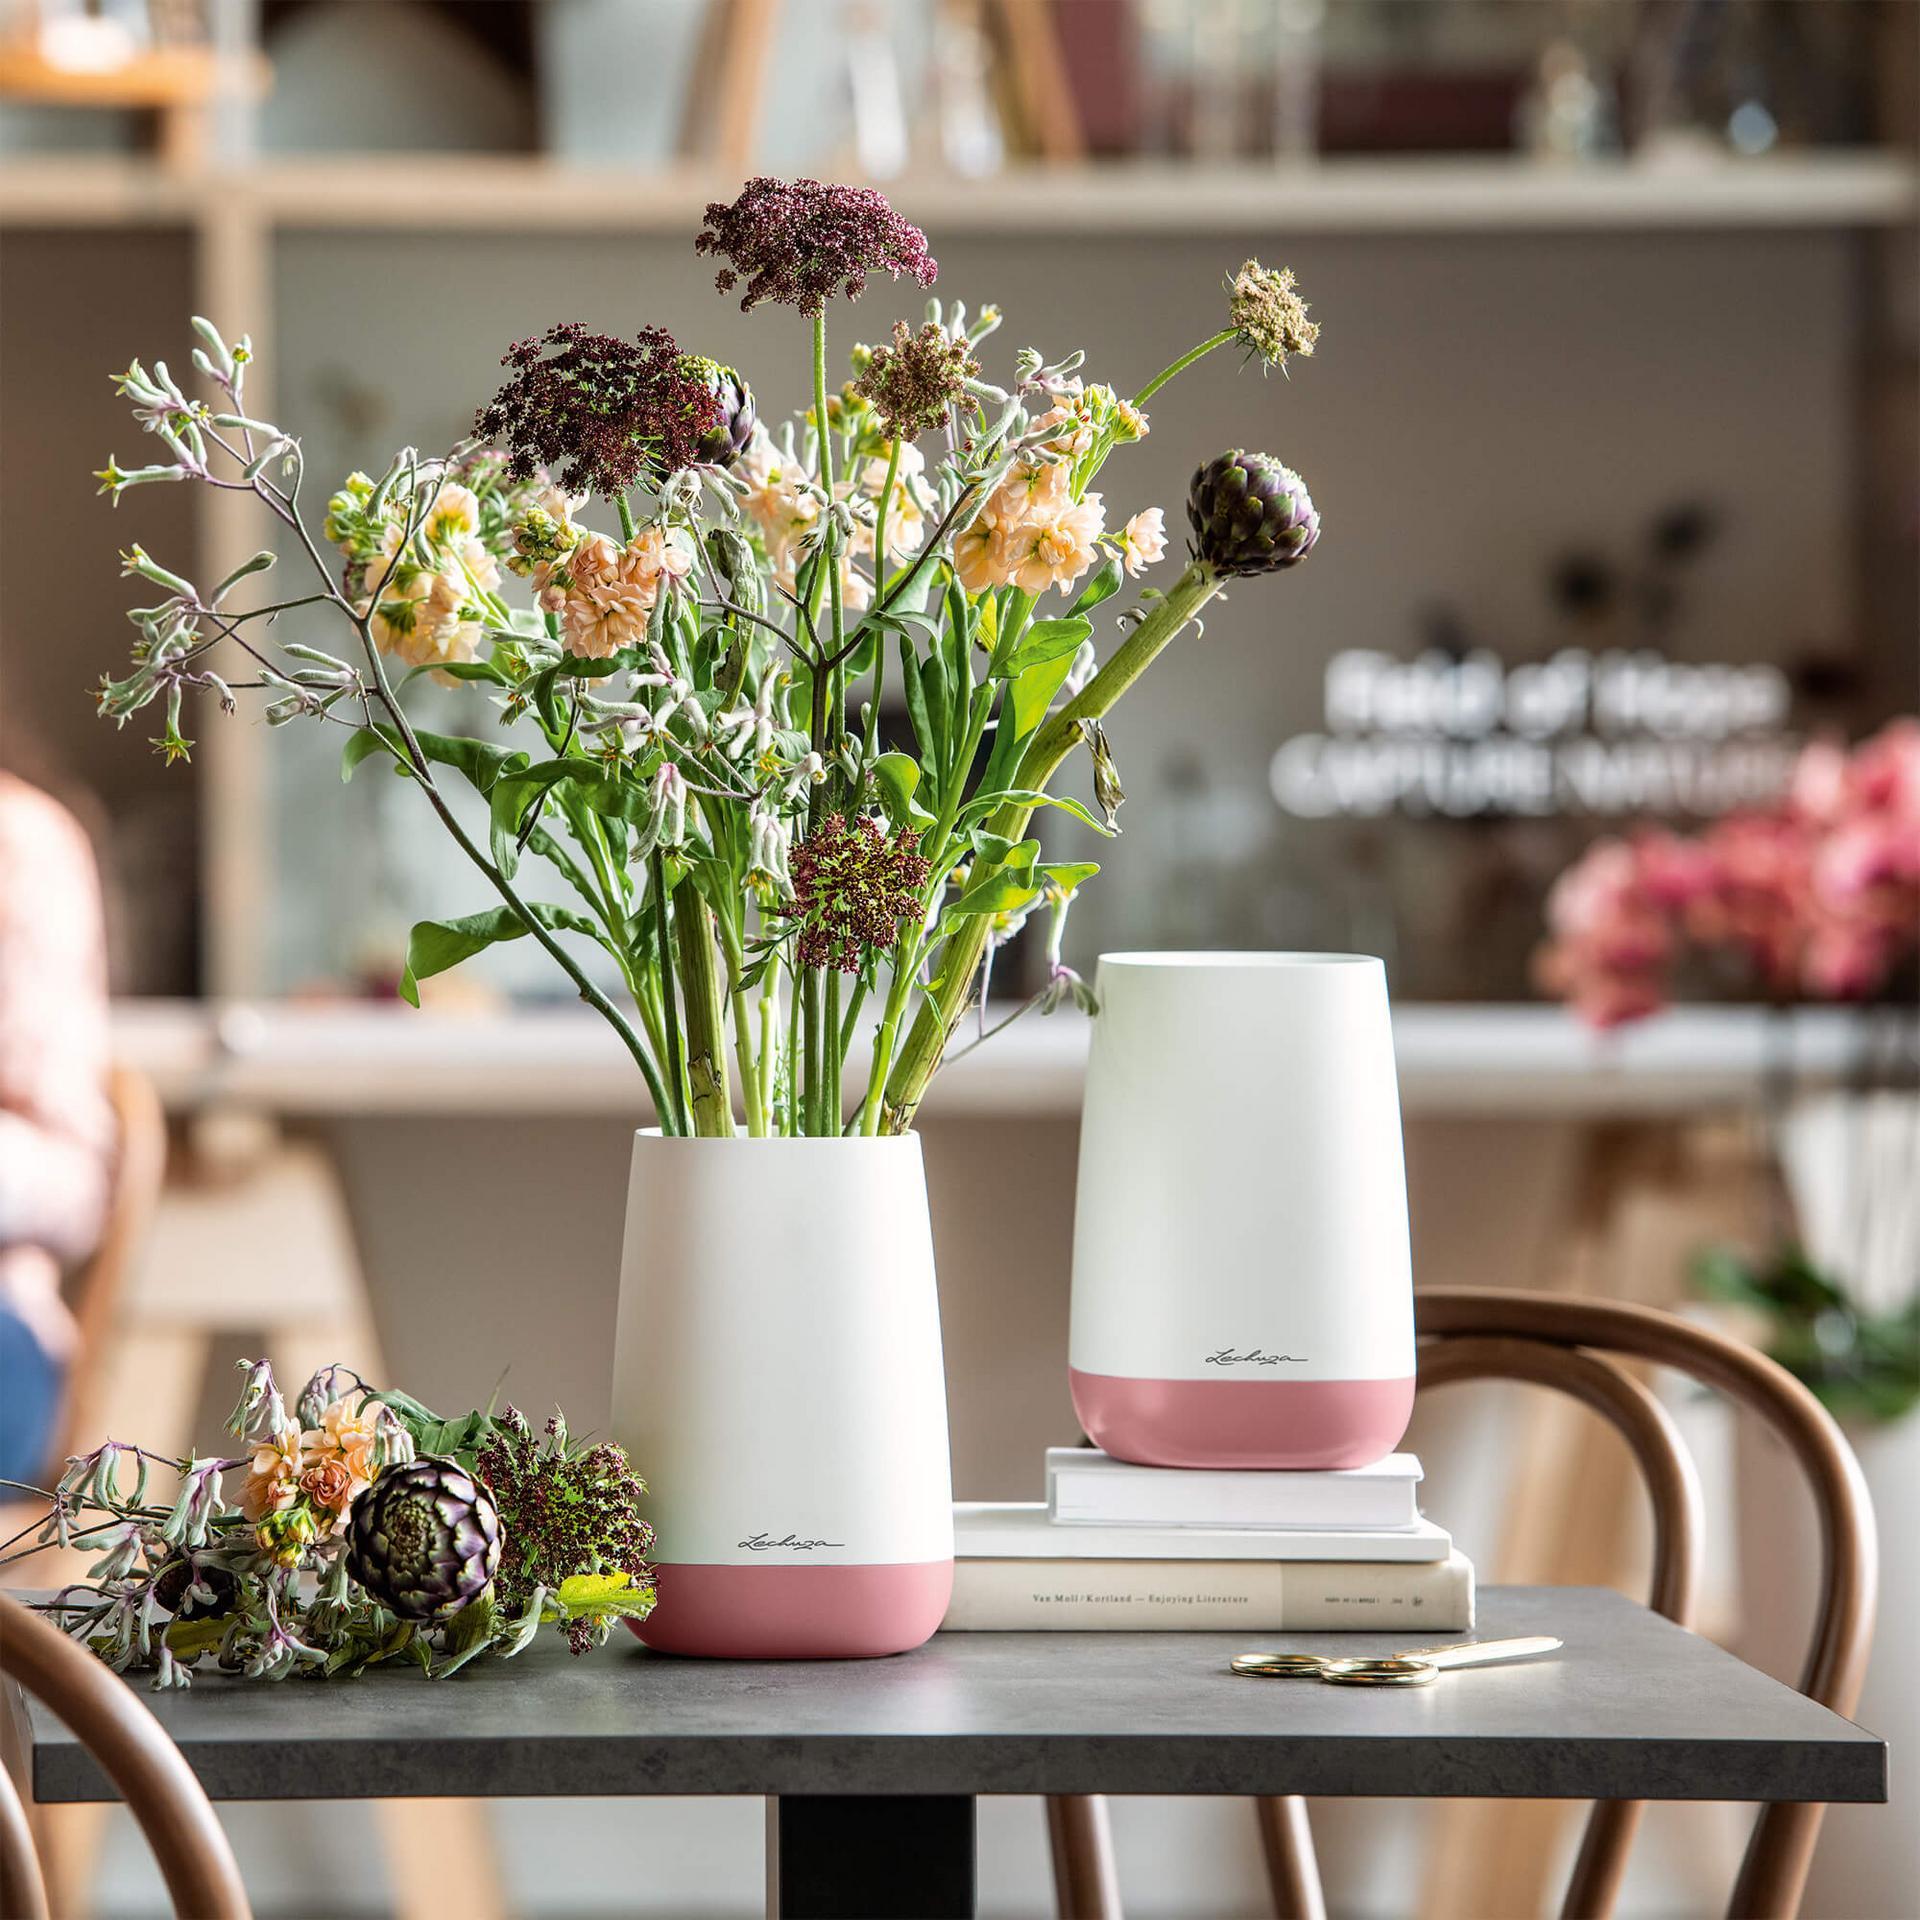 le_yula-flower_product_addi_01